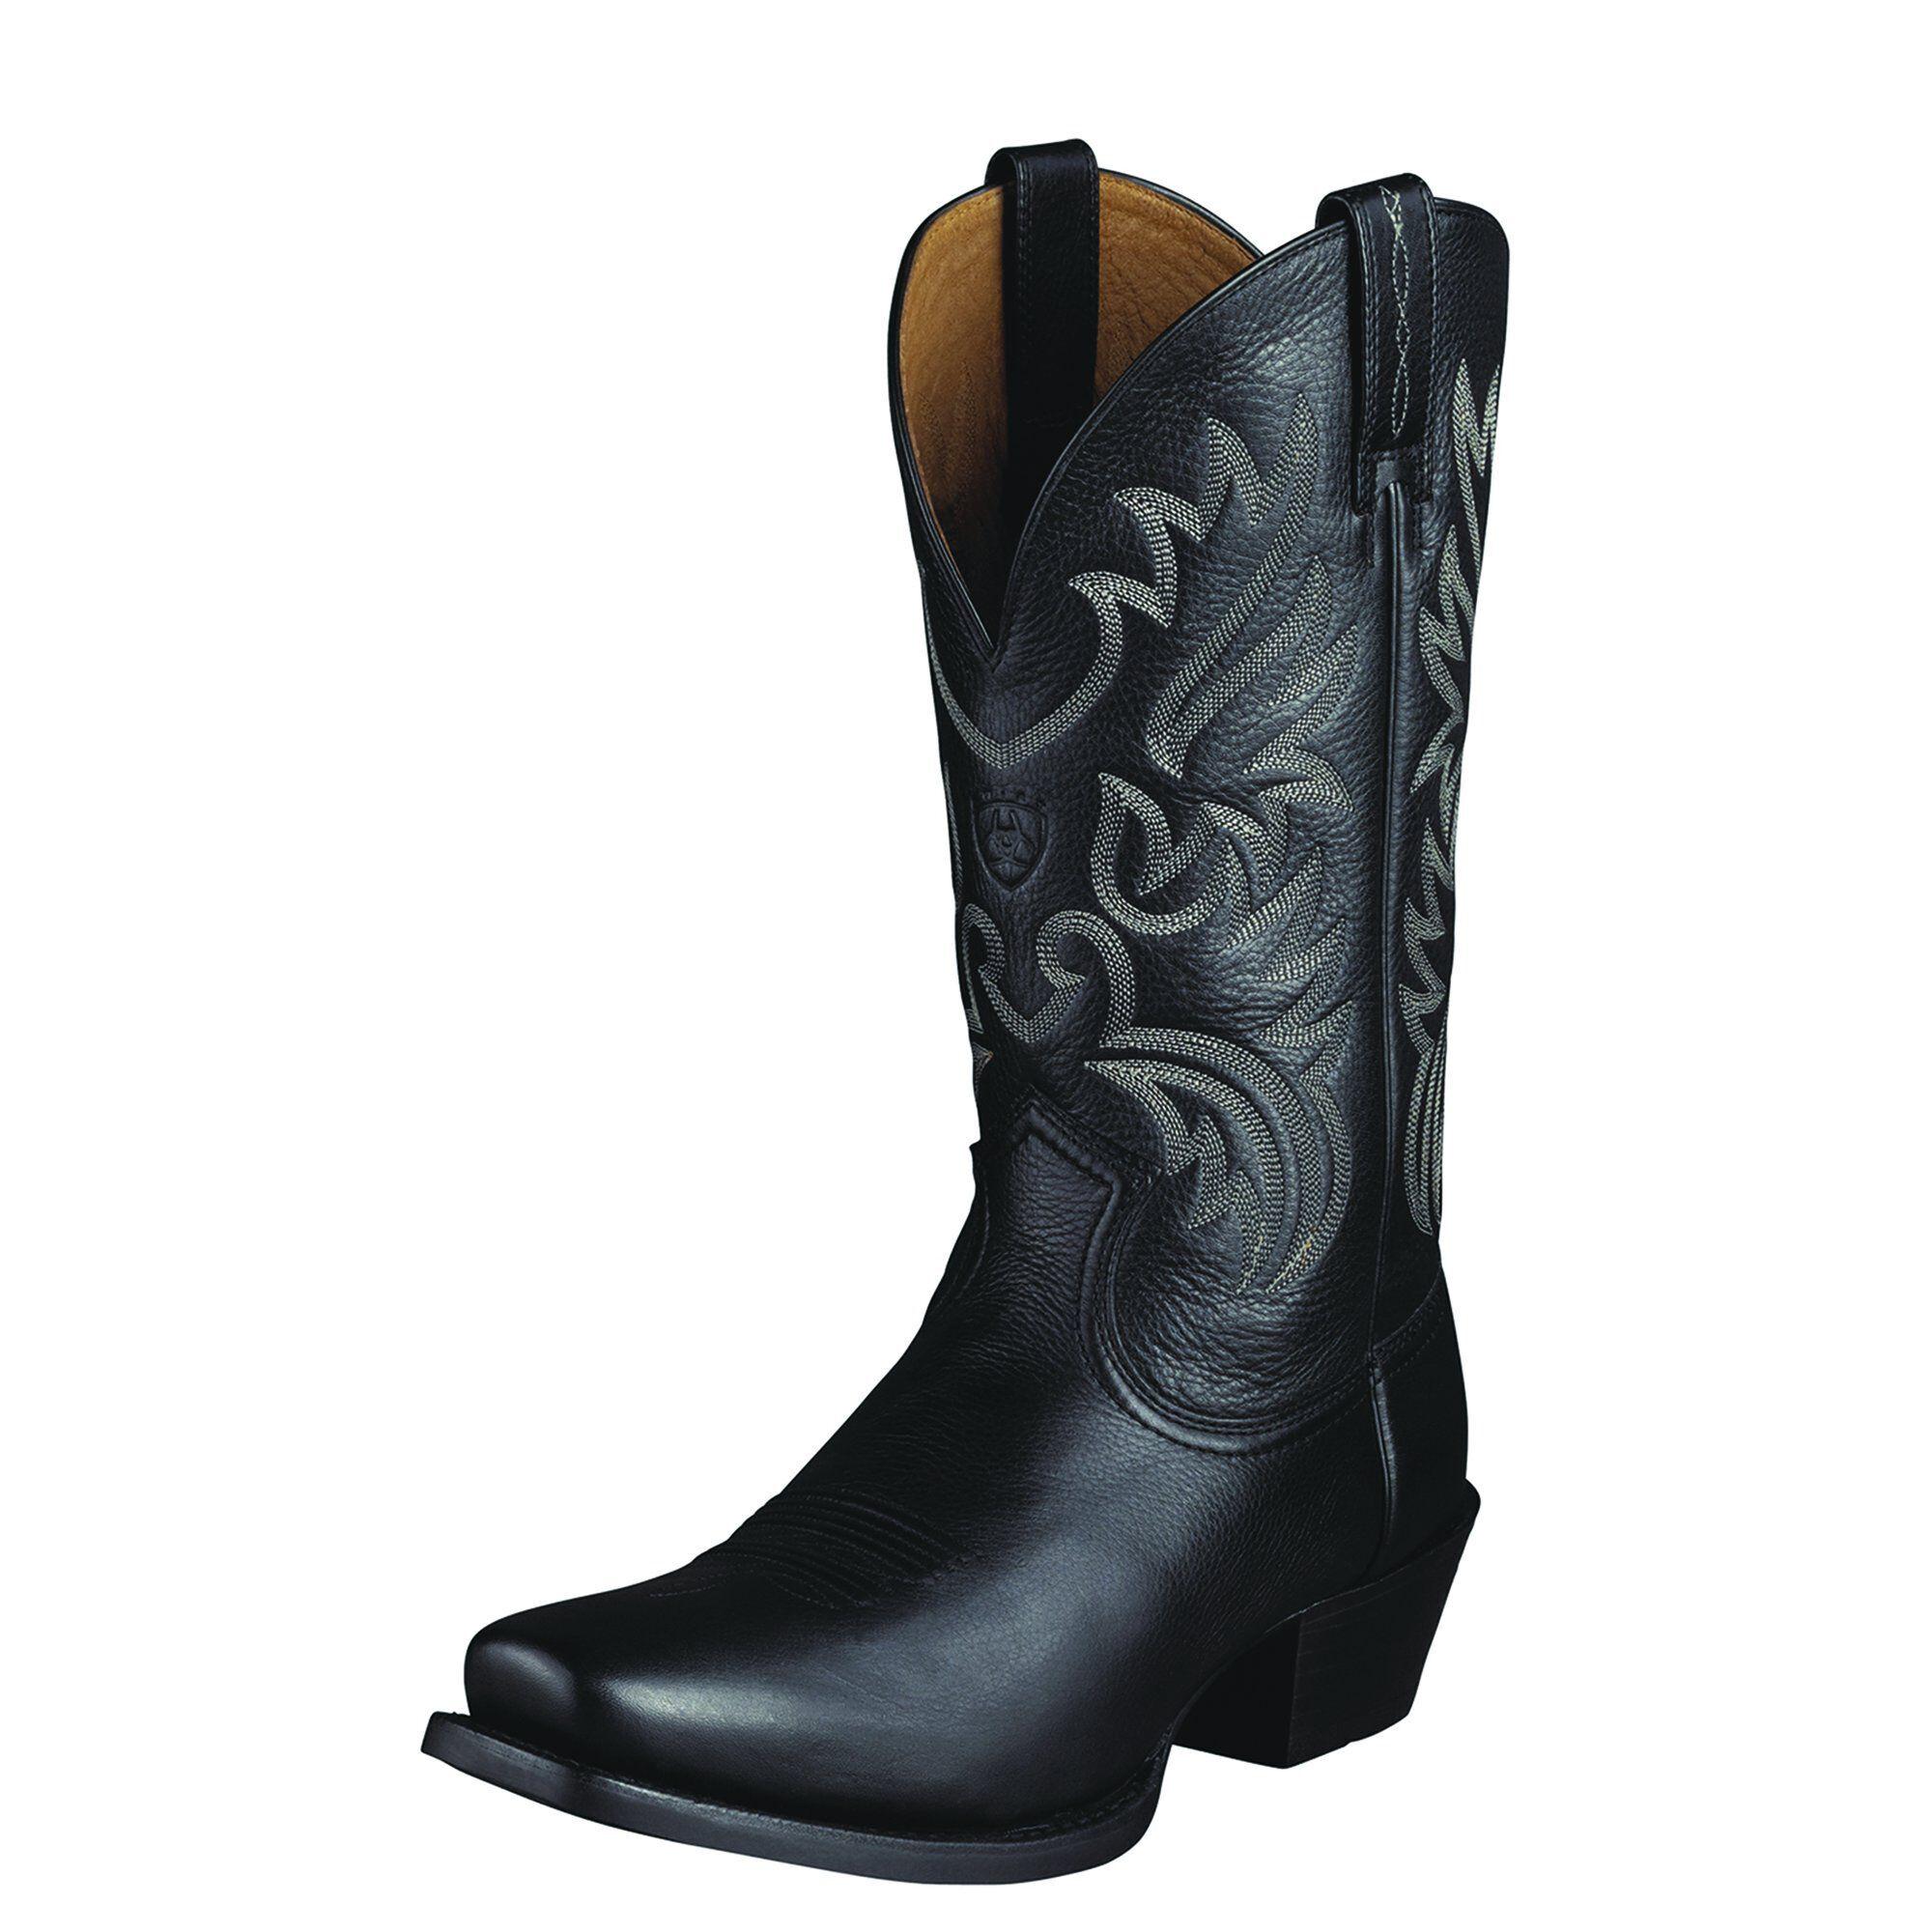 Ariat Men's Legend Western Boots in Black Deertan Leather, Size 11 EE / Wide by Ariat